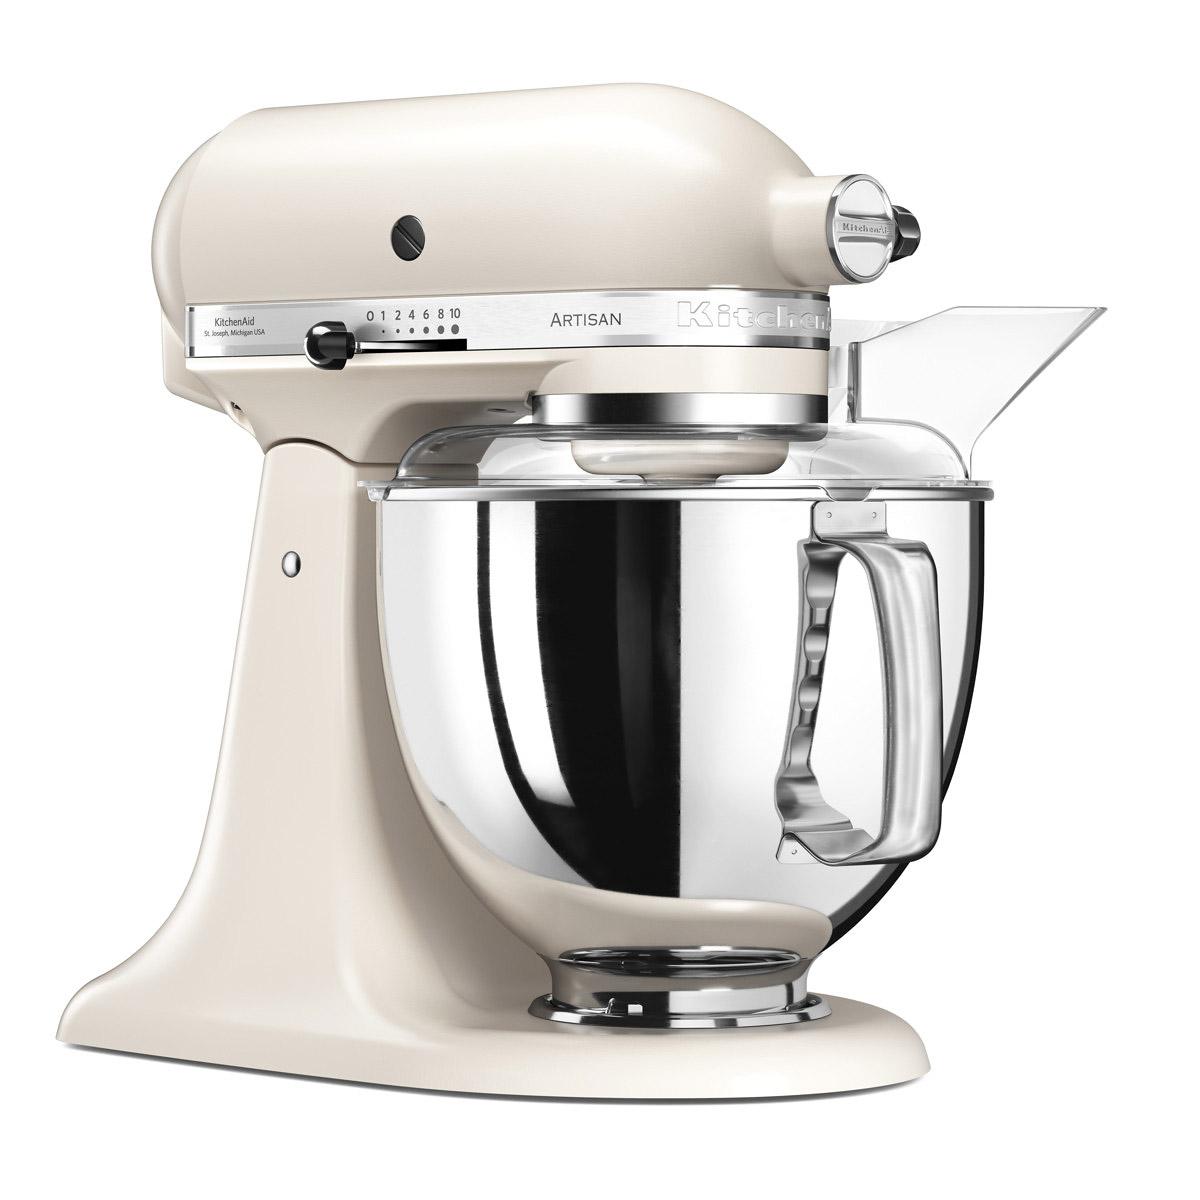 KitchenAid Artisan Elegance standmixer 4,8 liter Café Latte